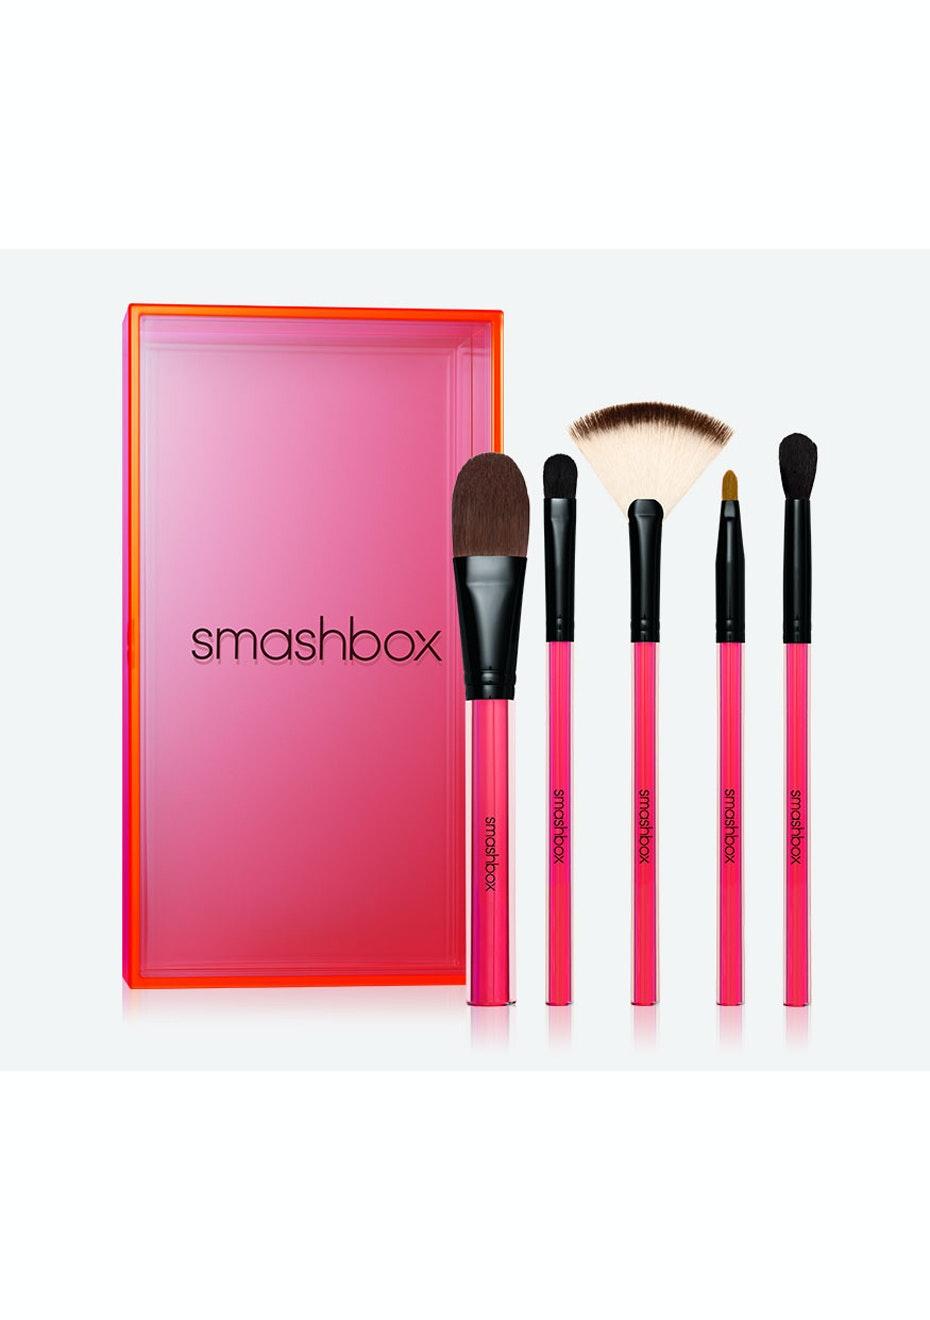 Smashbox - Light It Up Essential Brush Set